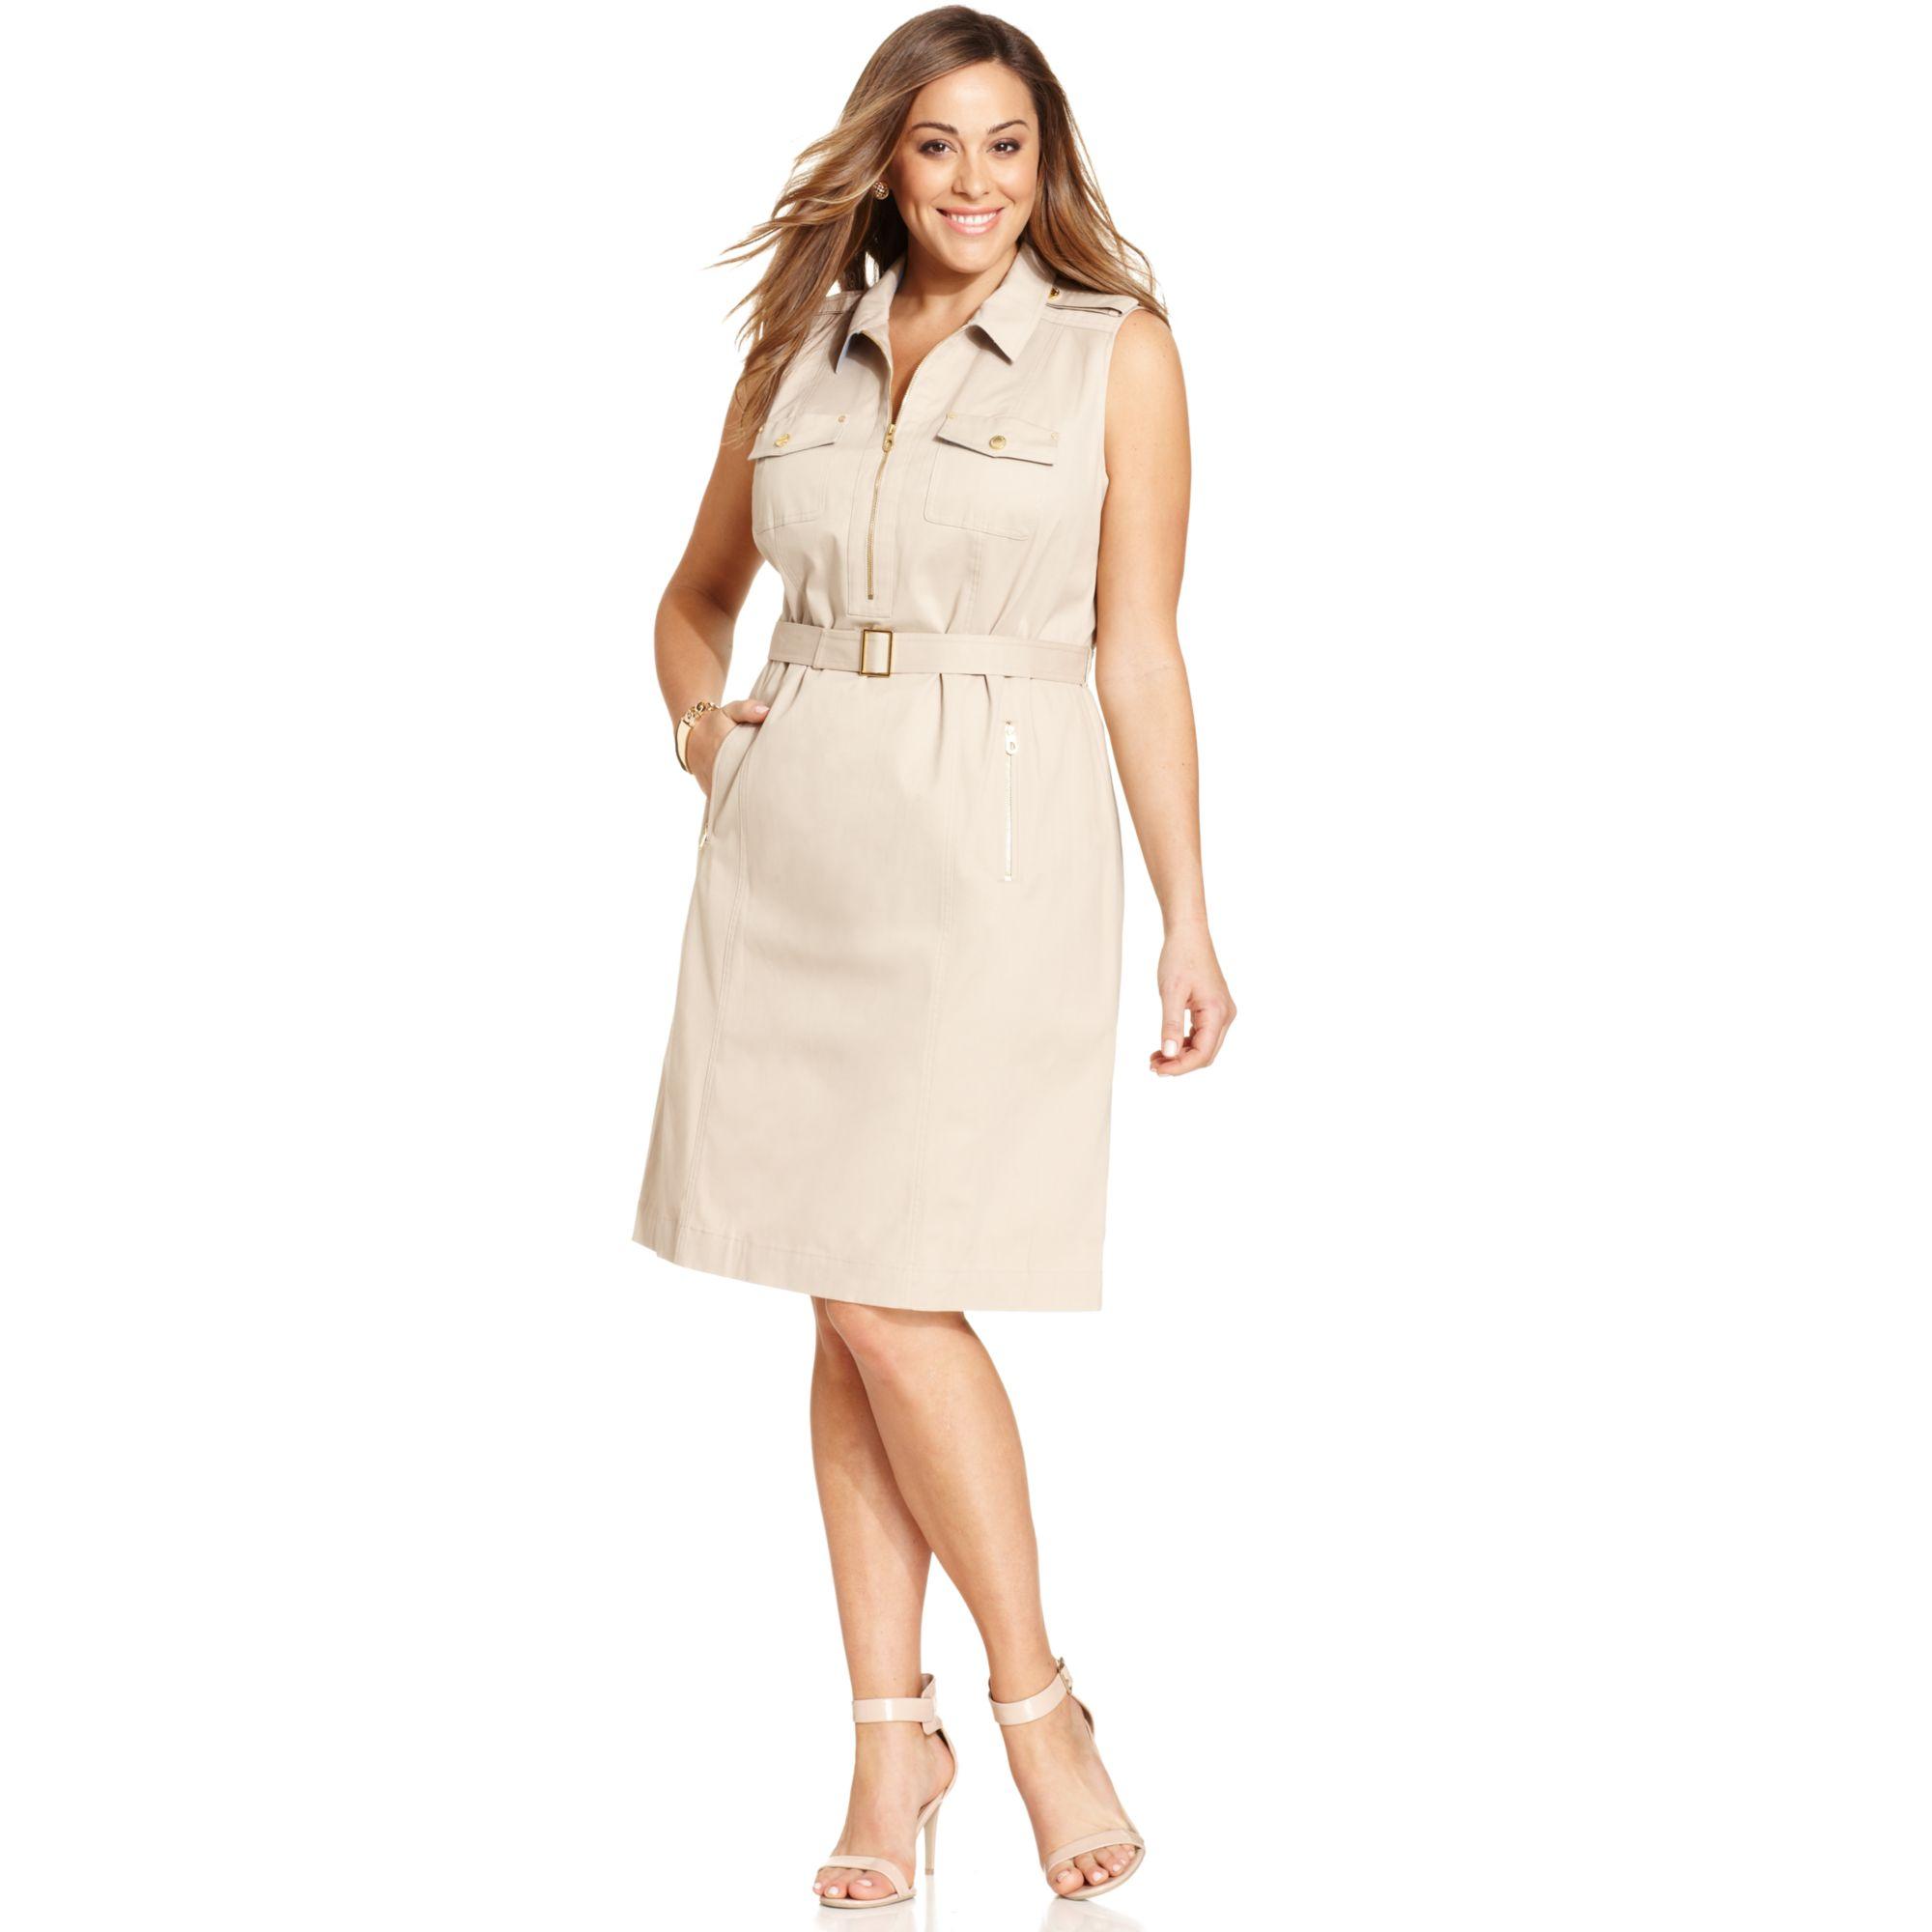 46fbfc029ef308 Jones New York Signature Plus Size Sleeveless Safari Dress in ...